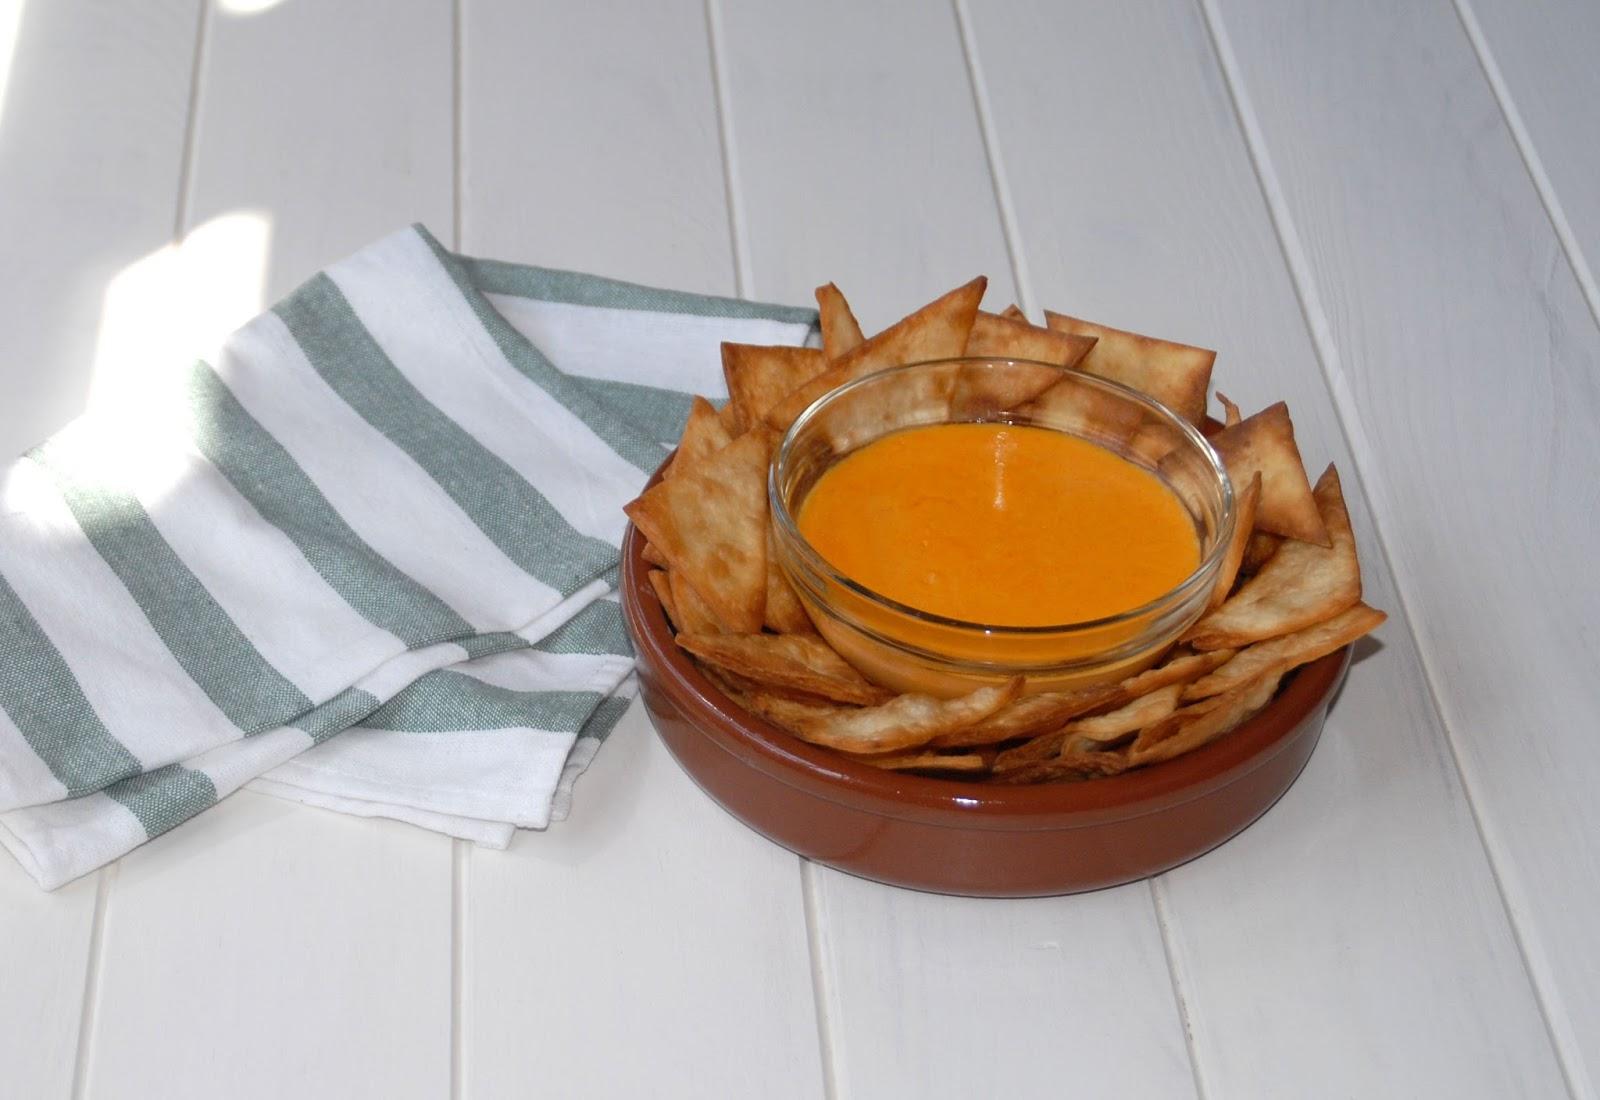 Receta de nachos rápidos con salsa de queso cheddar para dippear